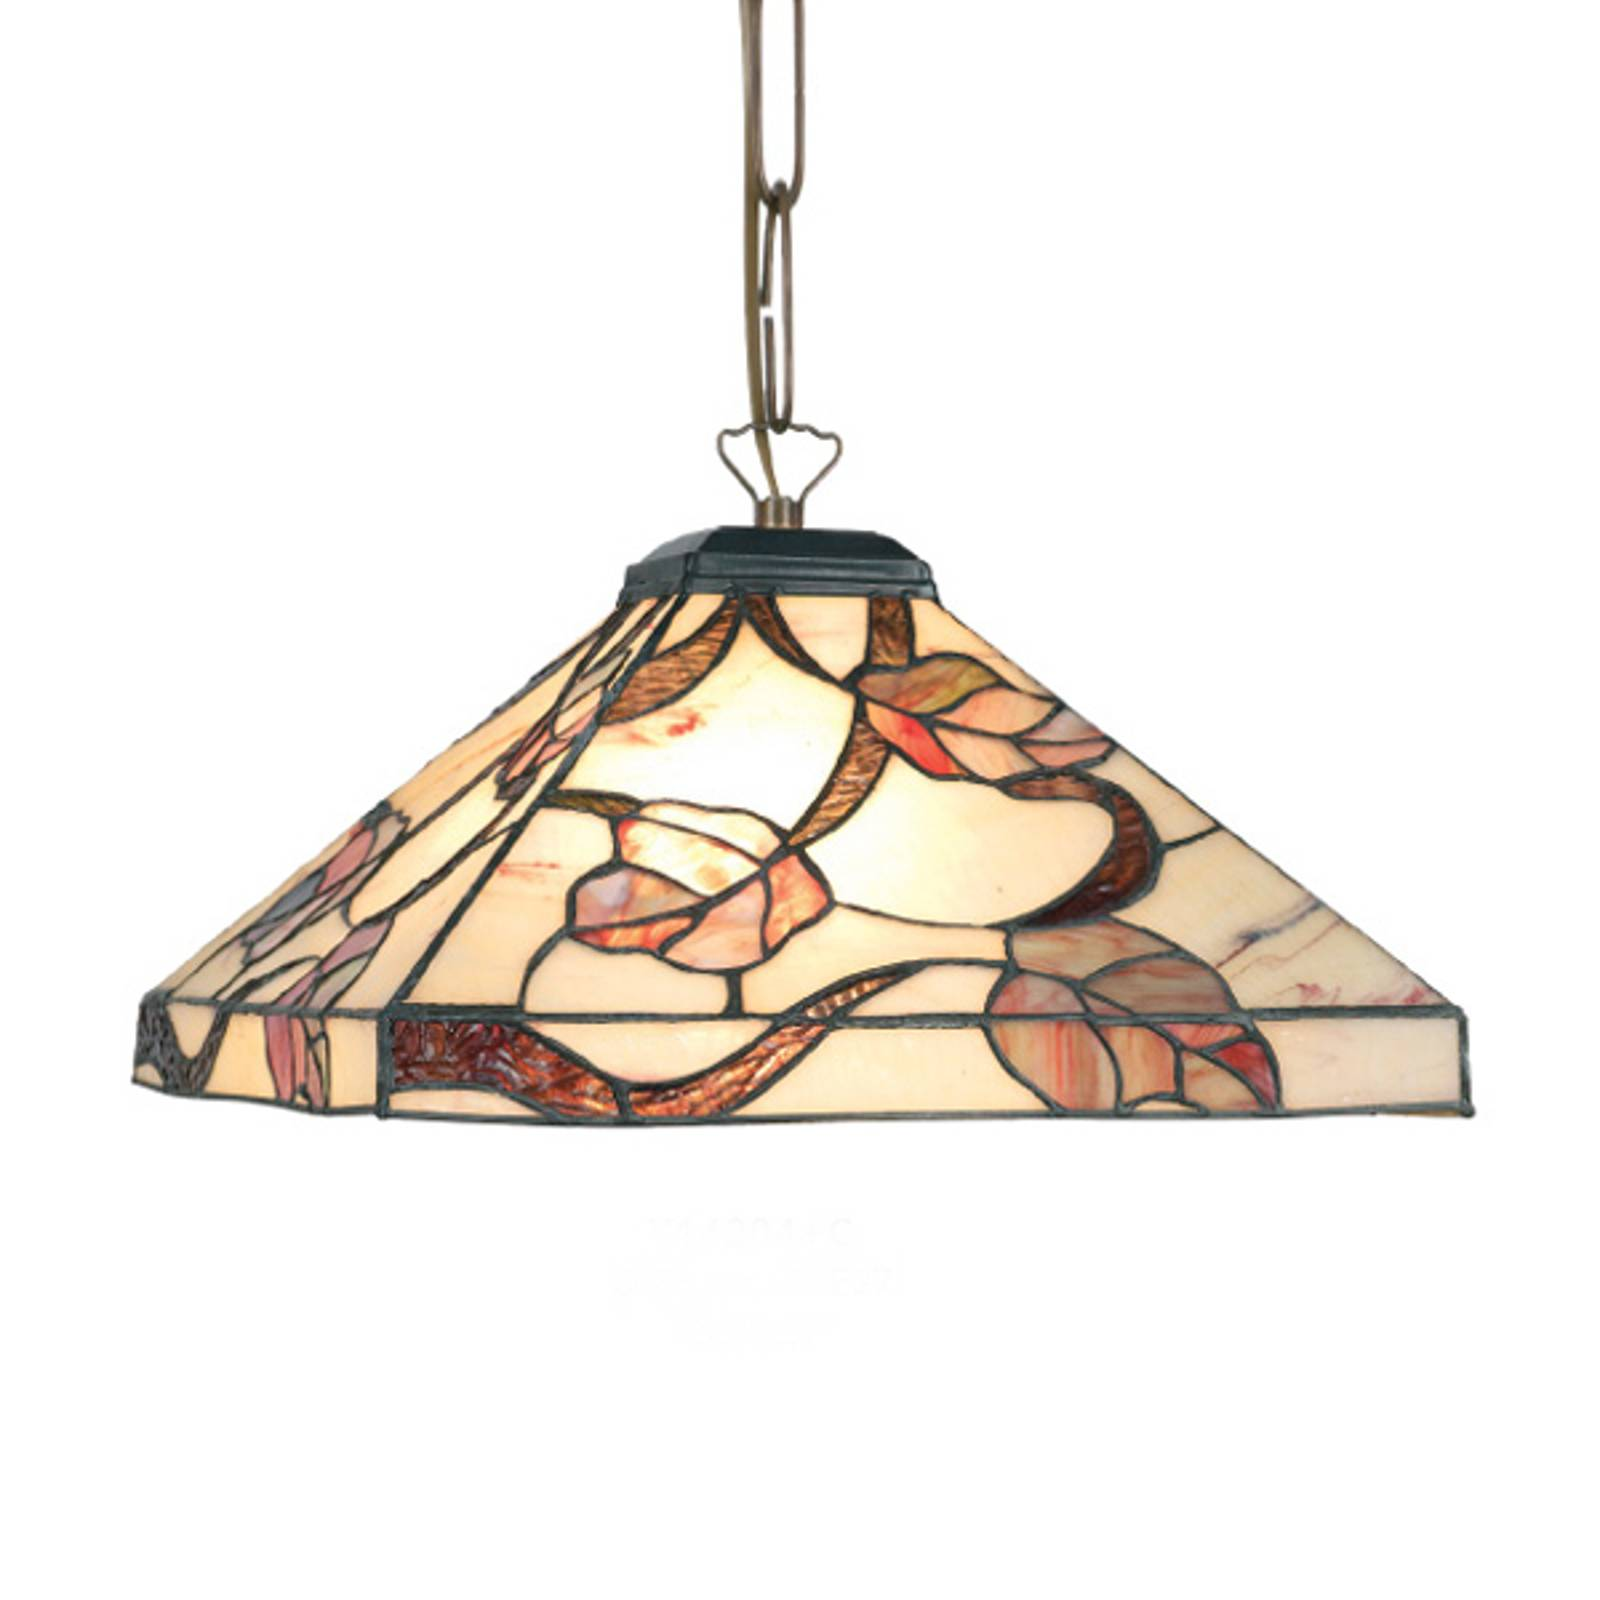 Appolonia hanglamp in Tiffany-stijl